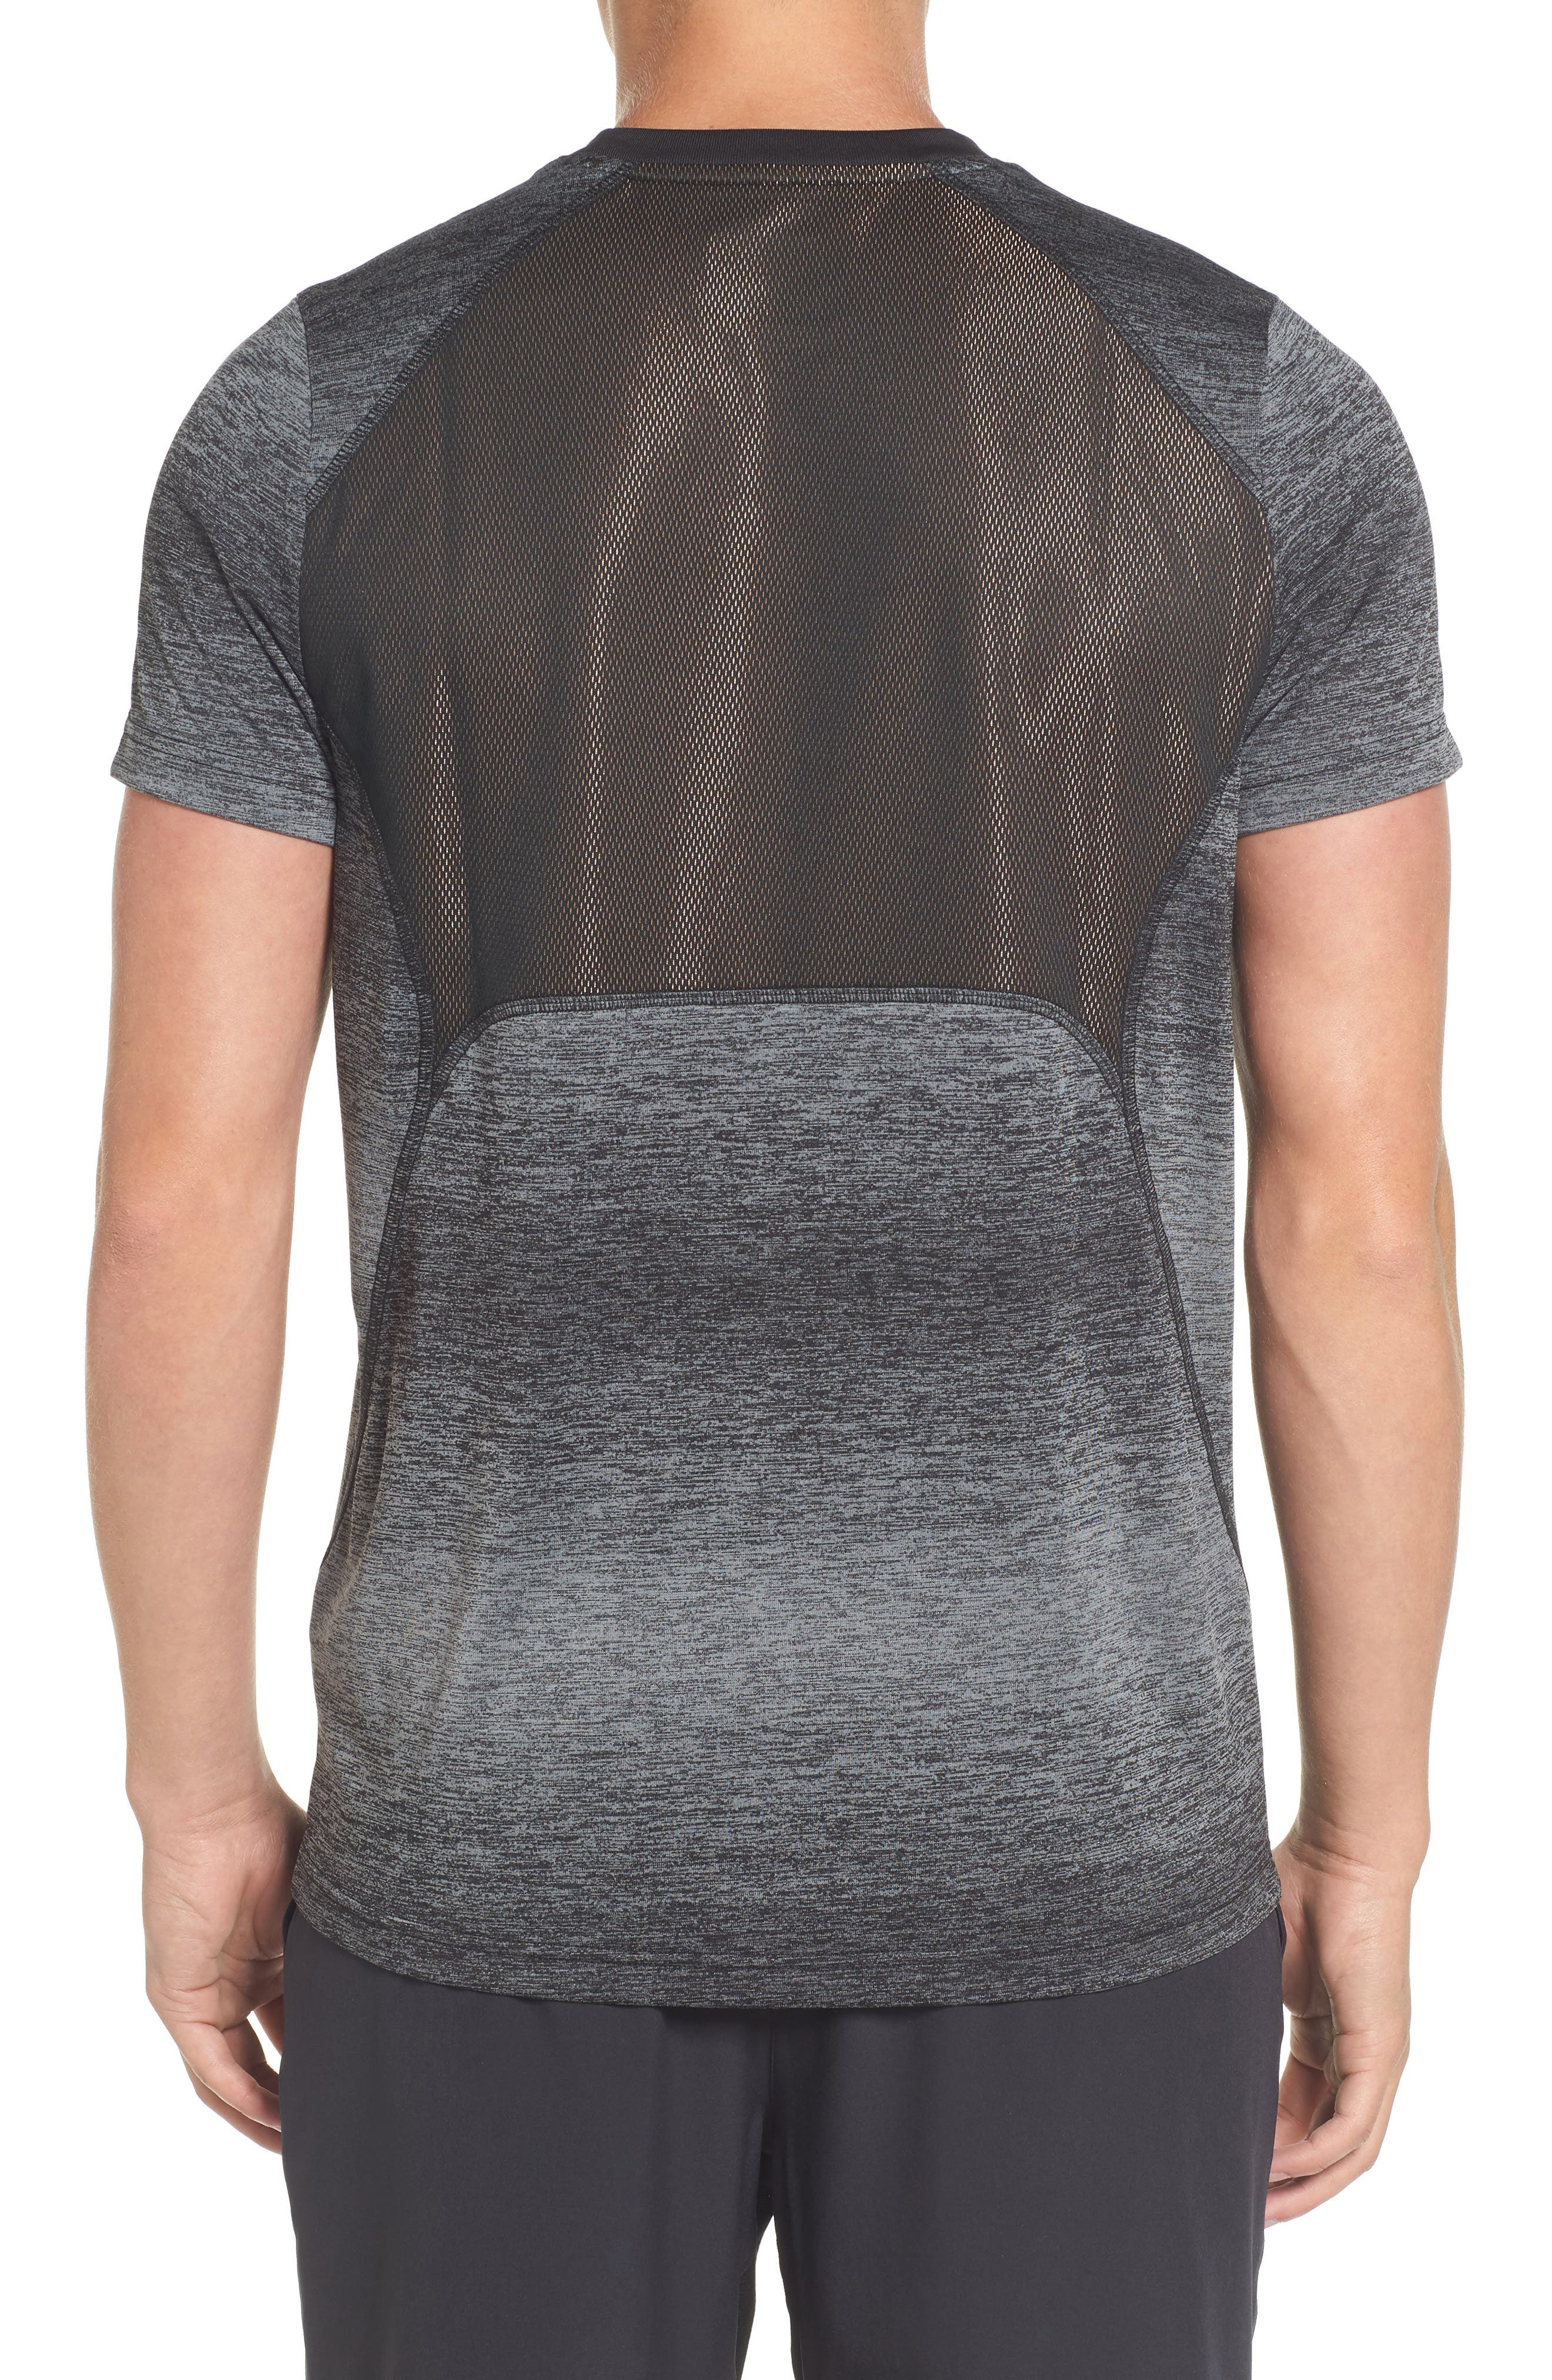 Ultra Dry Tech T-Shirt,                             Alternate thumbnail 2, color,                             007